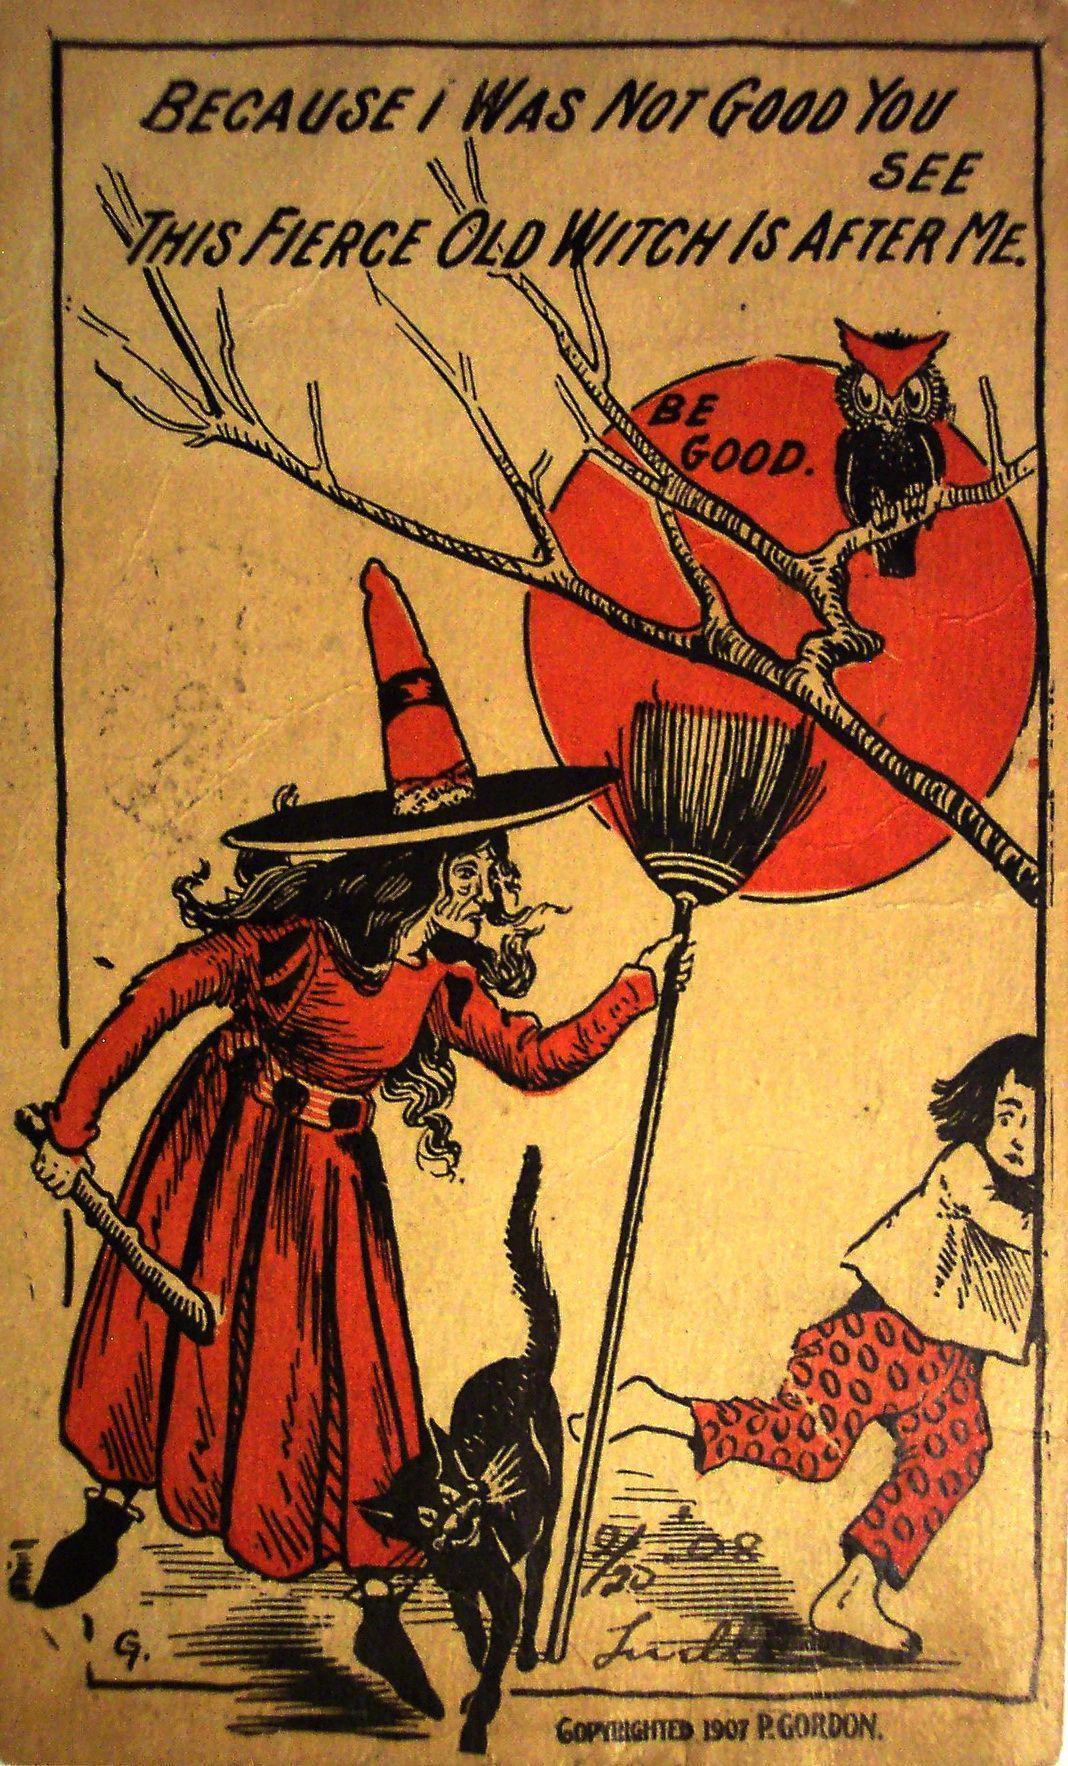 Vintage postcard: tumblr_mciyw2qxat1rhhnauo3_1280.jpg (1068×1766)